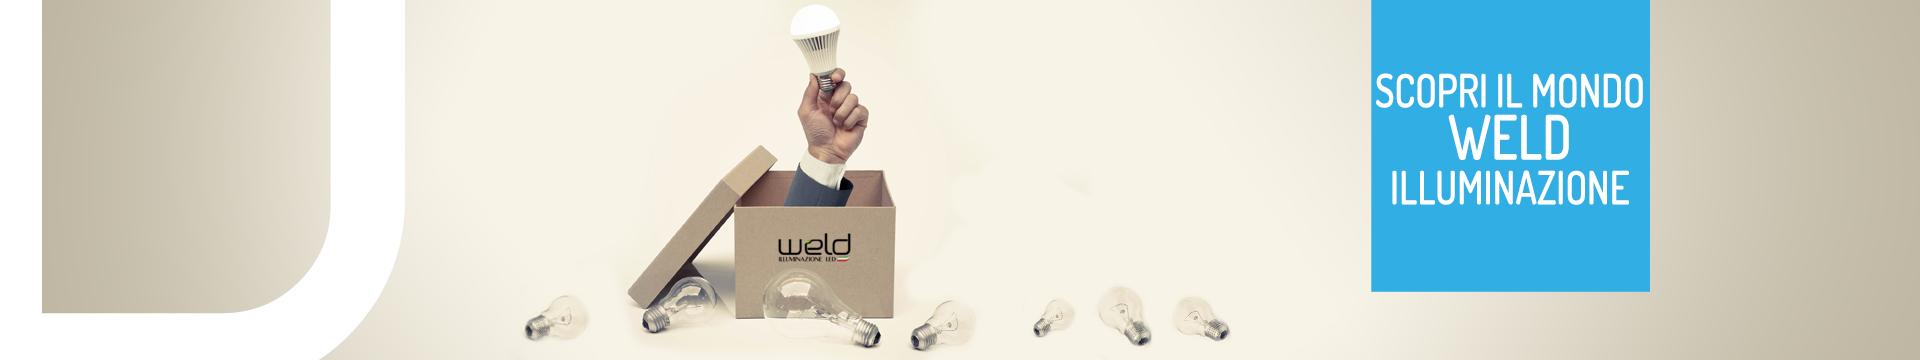 slider_weld2